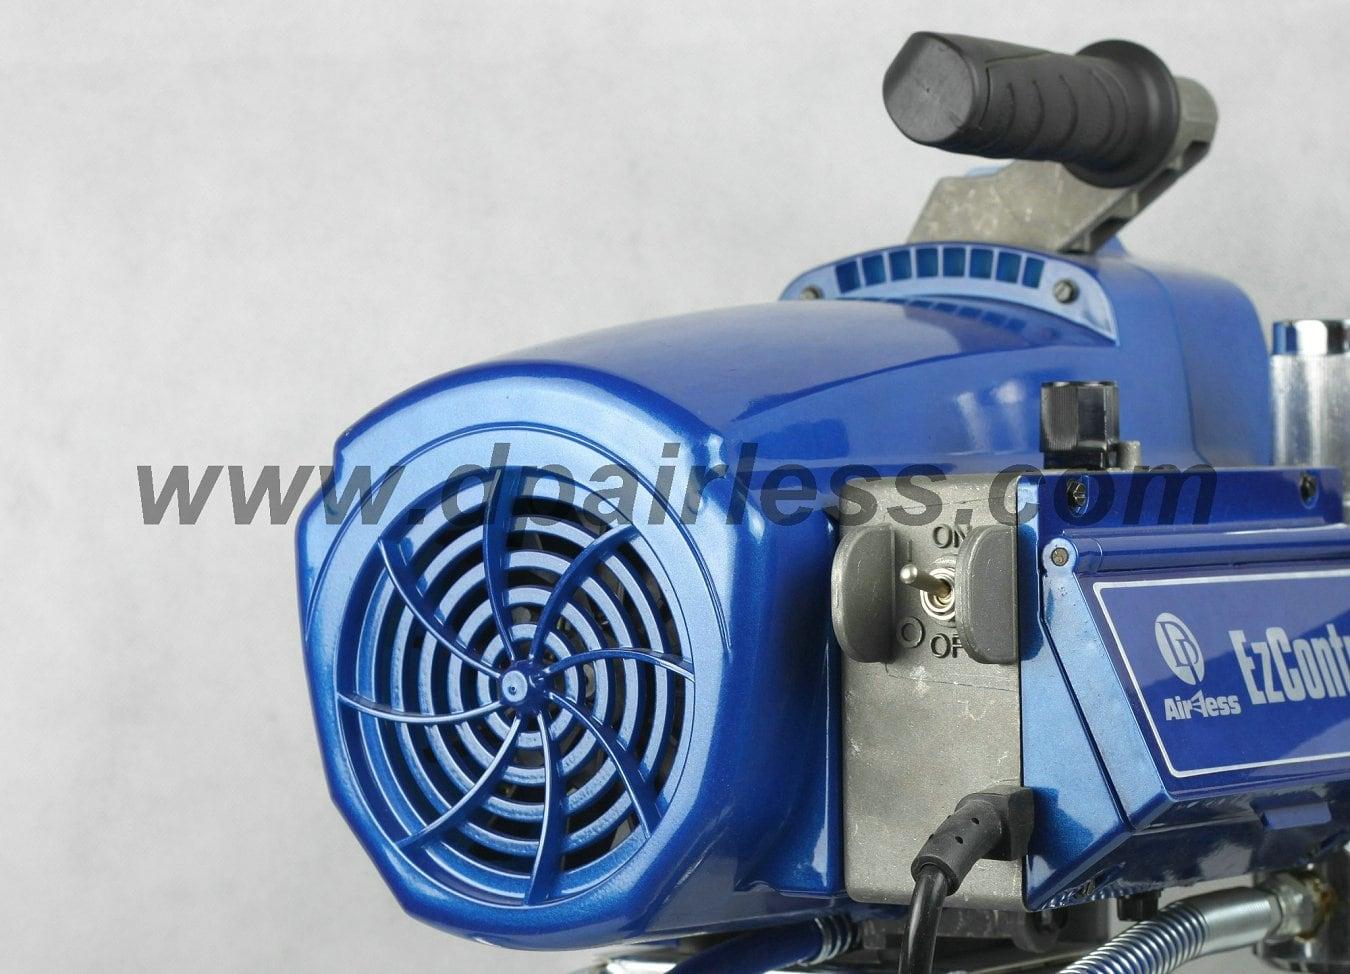 Dp 6490ib professional pintura pulverizador brushless for Bomba manual para pintar con cal